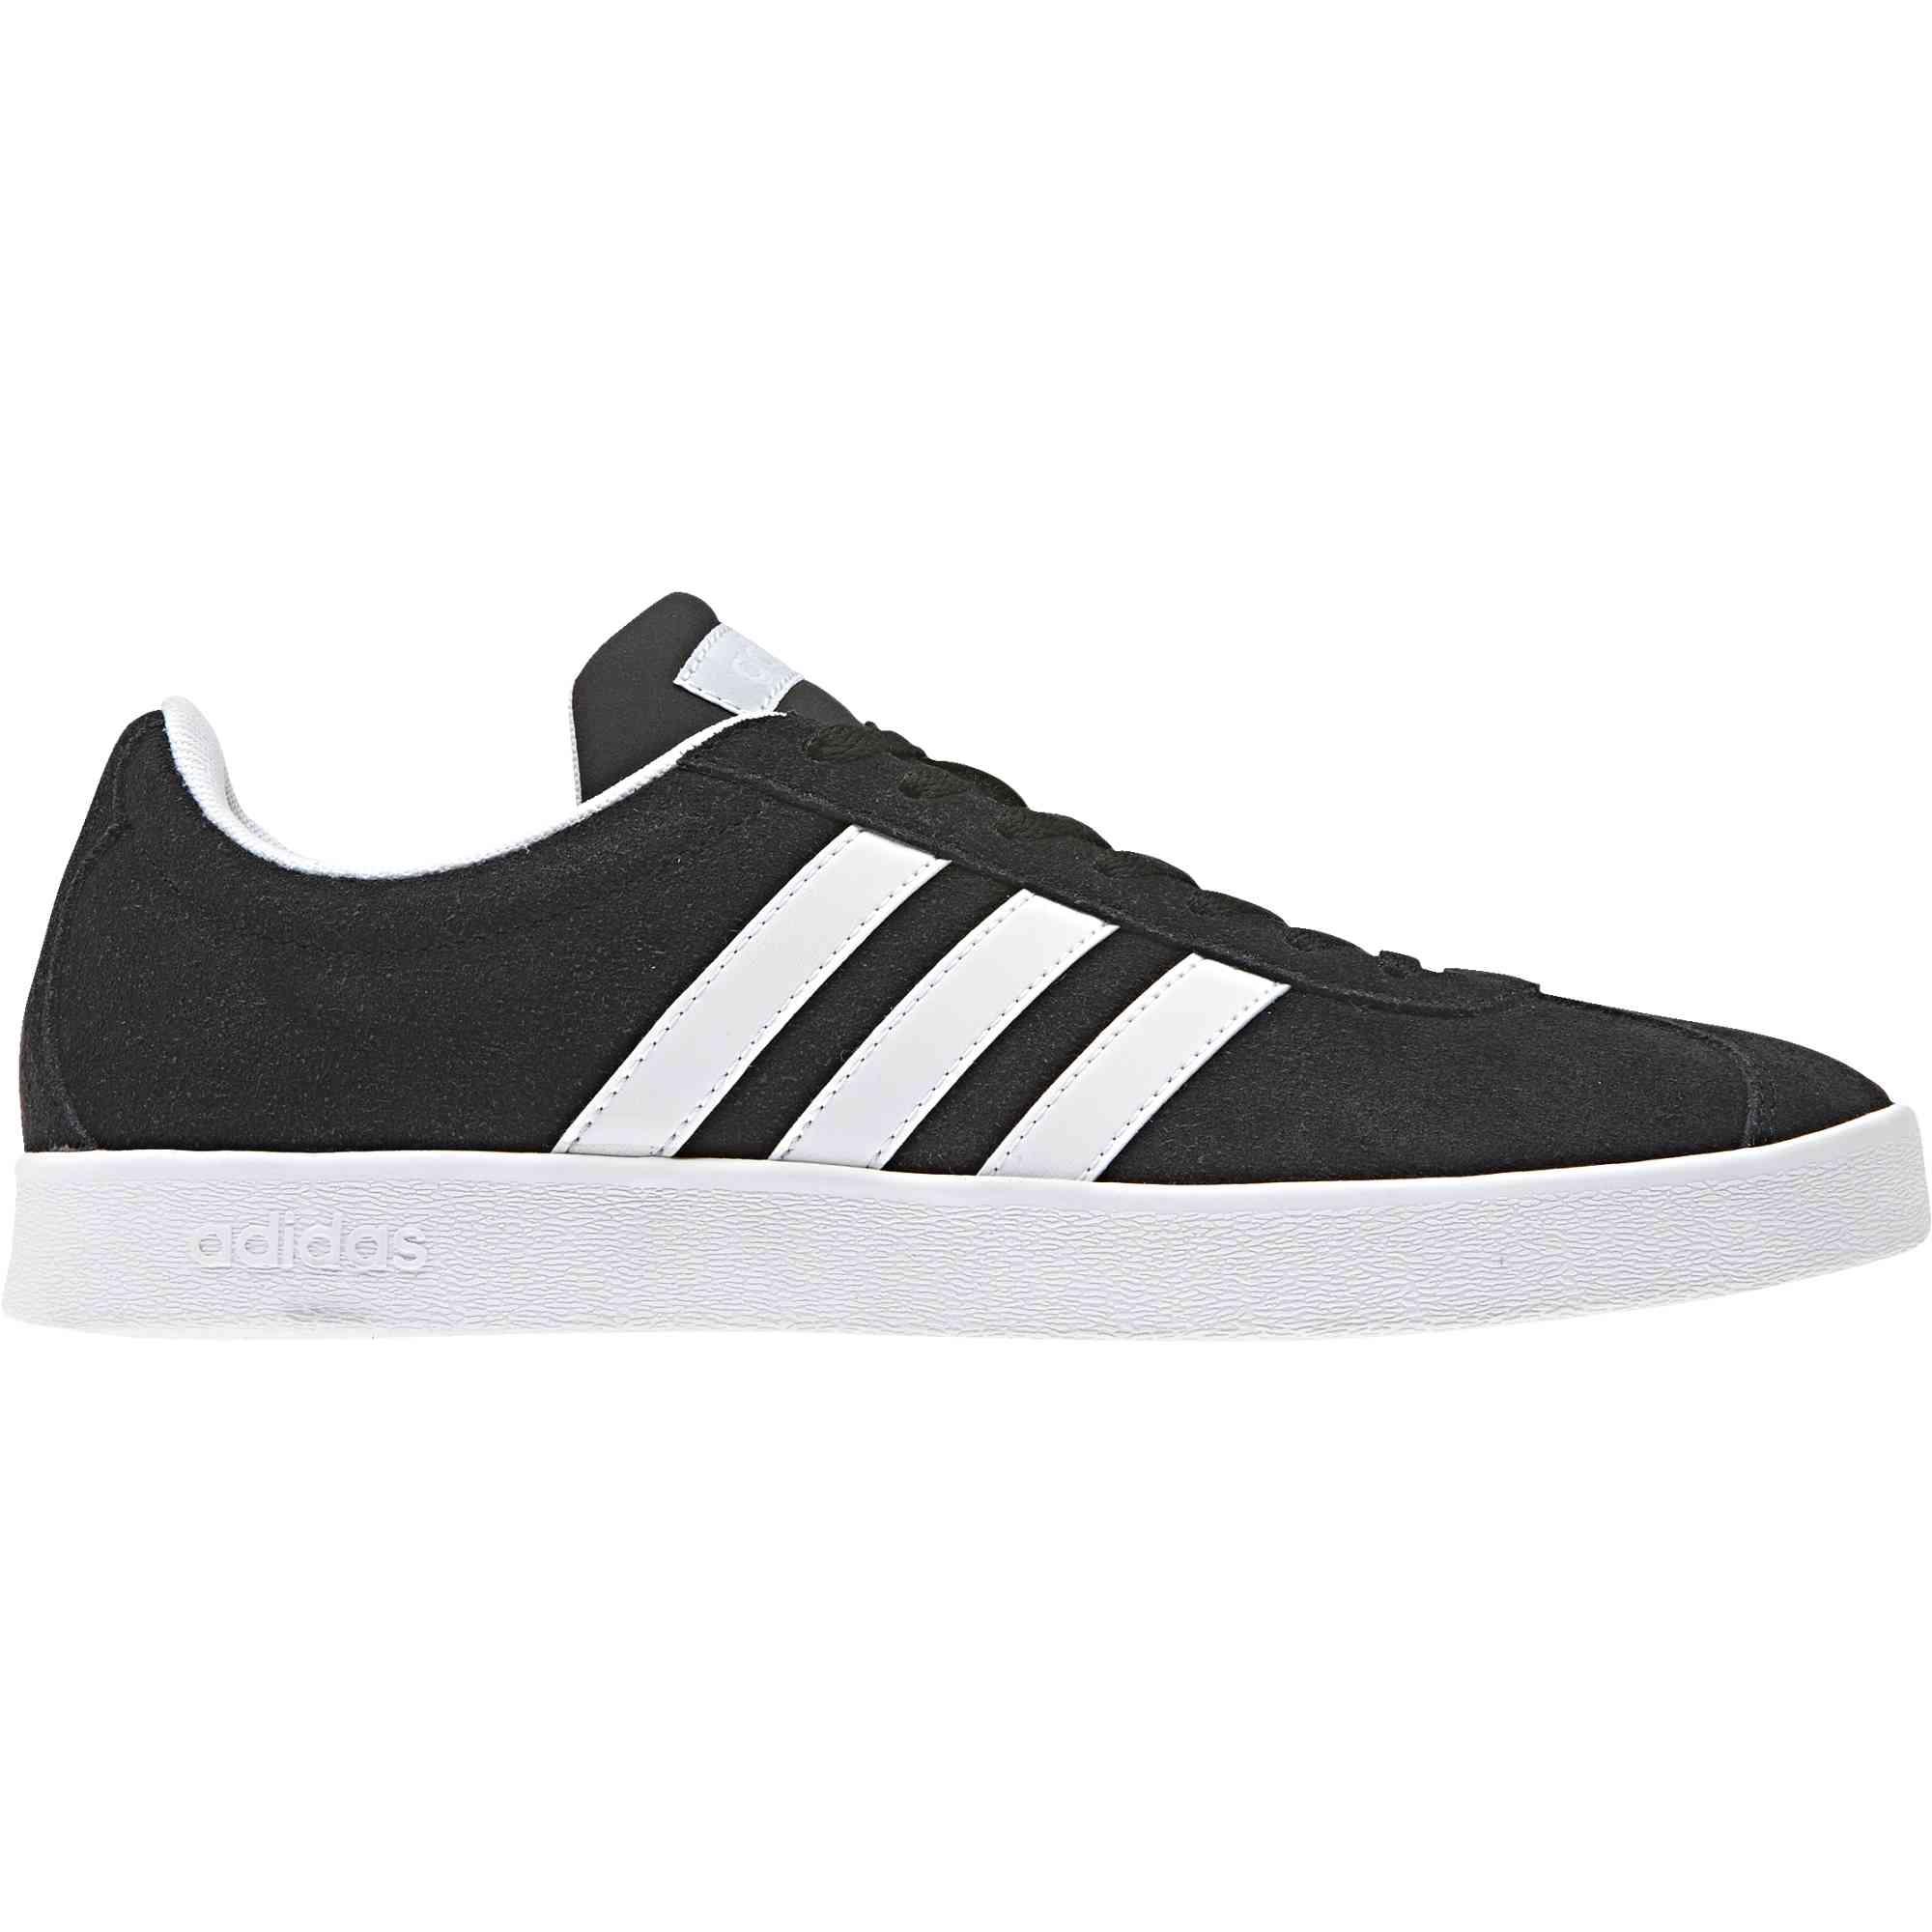 Adidas Vulc Court 2 Dames sneakers